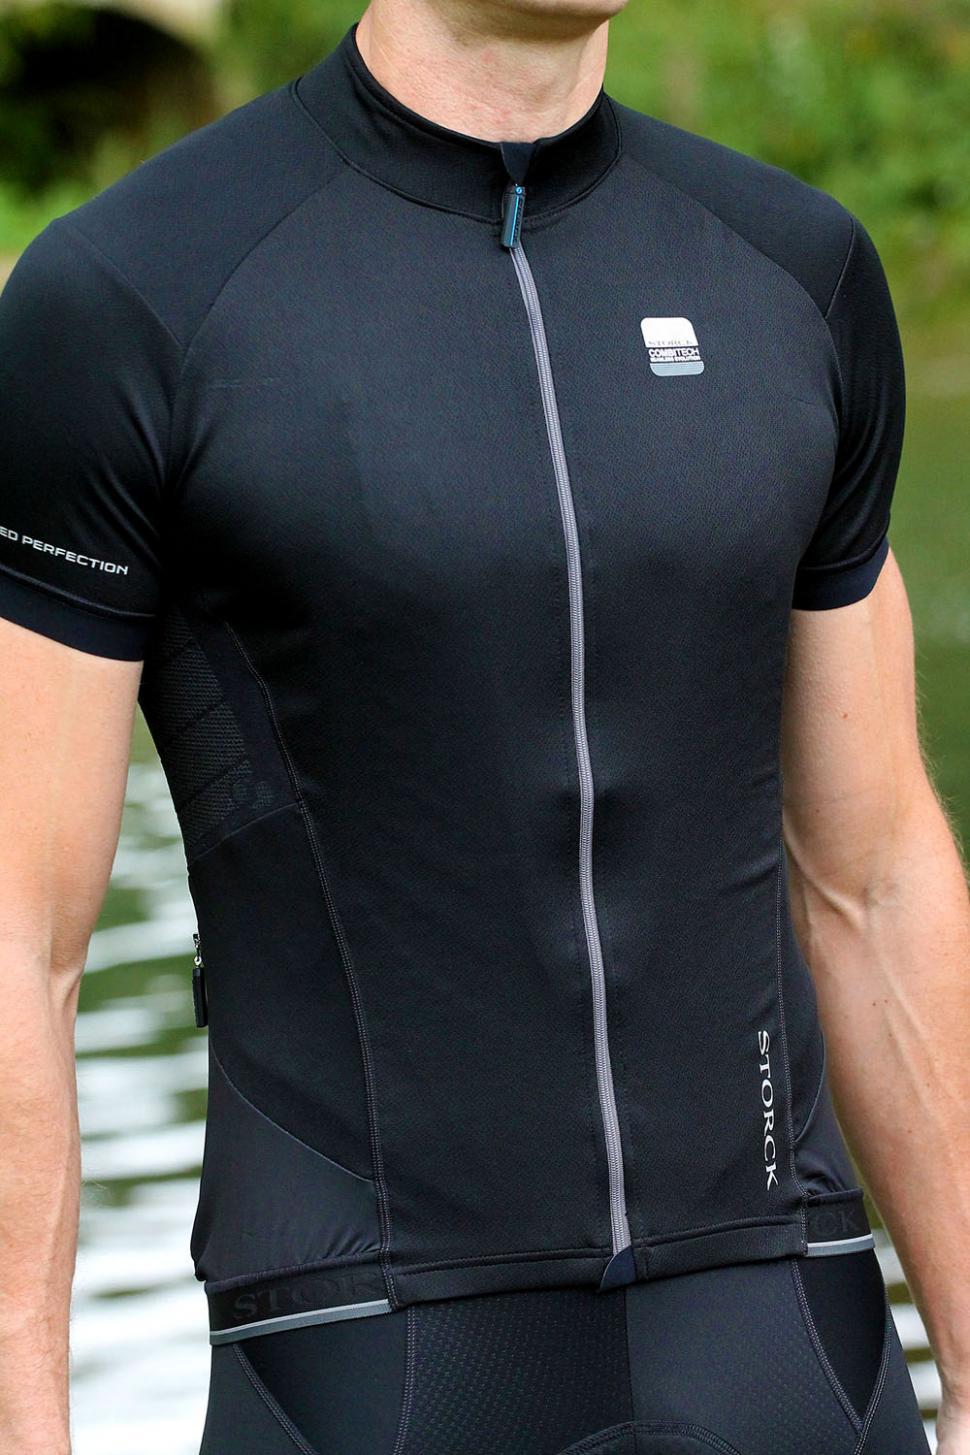 Storck Pro Full Zip jersey